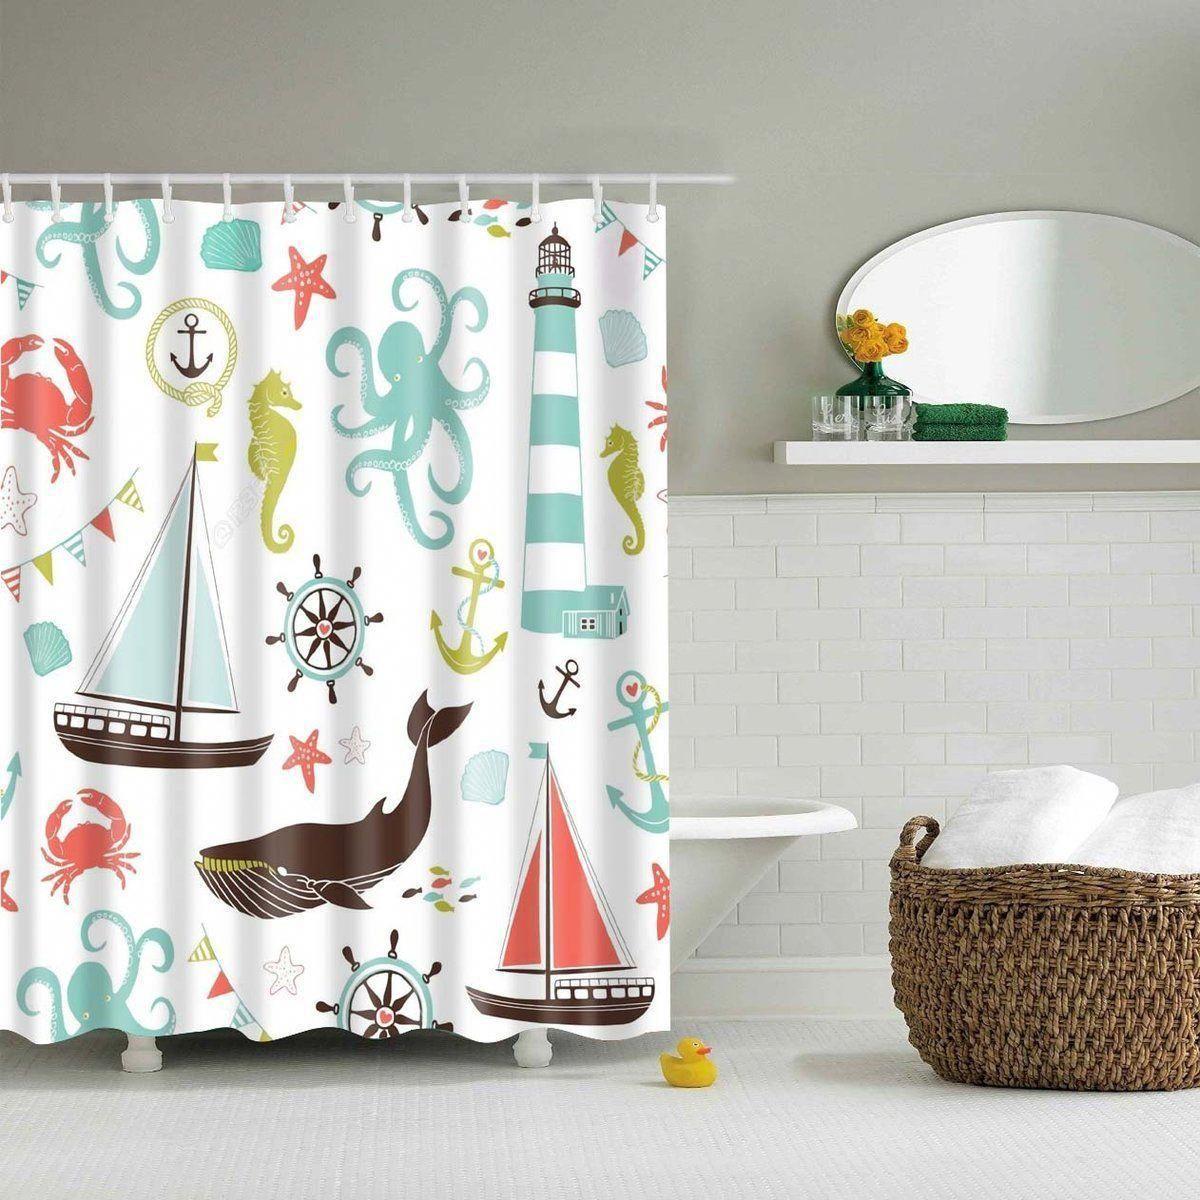 Cute Marine Product Cartoon Kids Shower Curtain Bathroom Decor